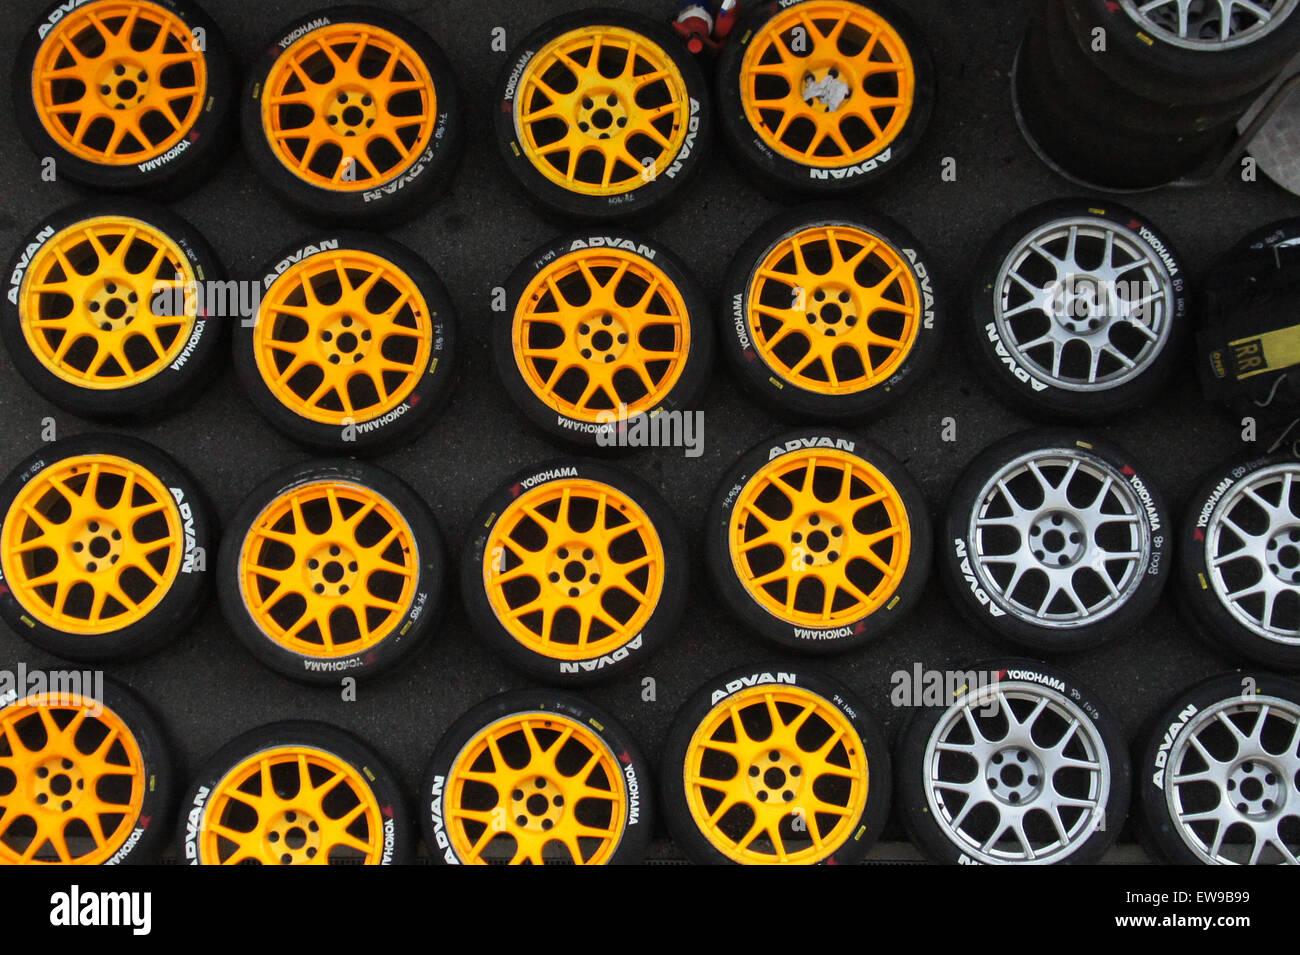 Yokohama Advan tires 2012 WTCC Race of Japan - Stock Image